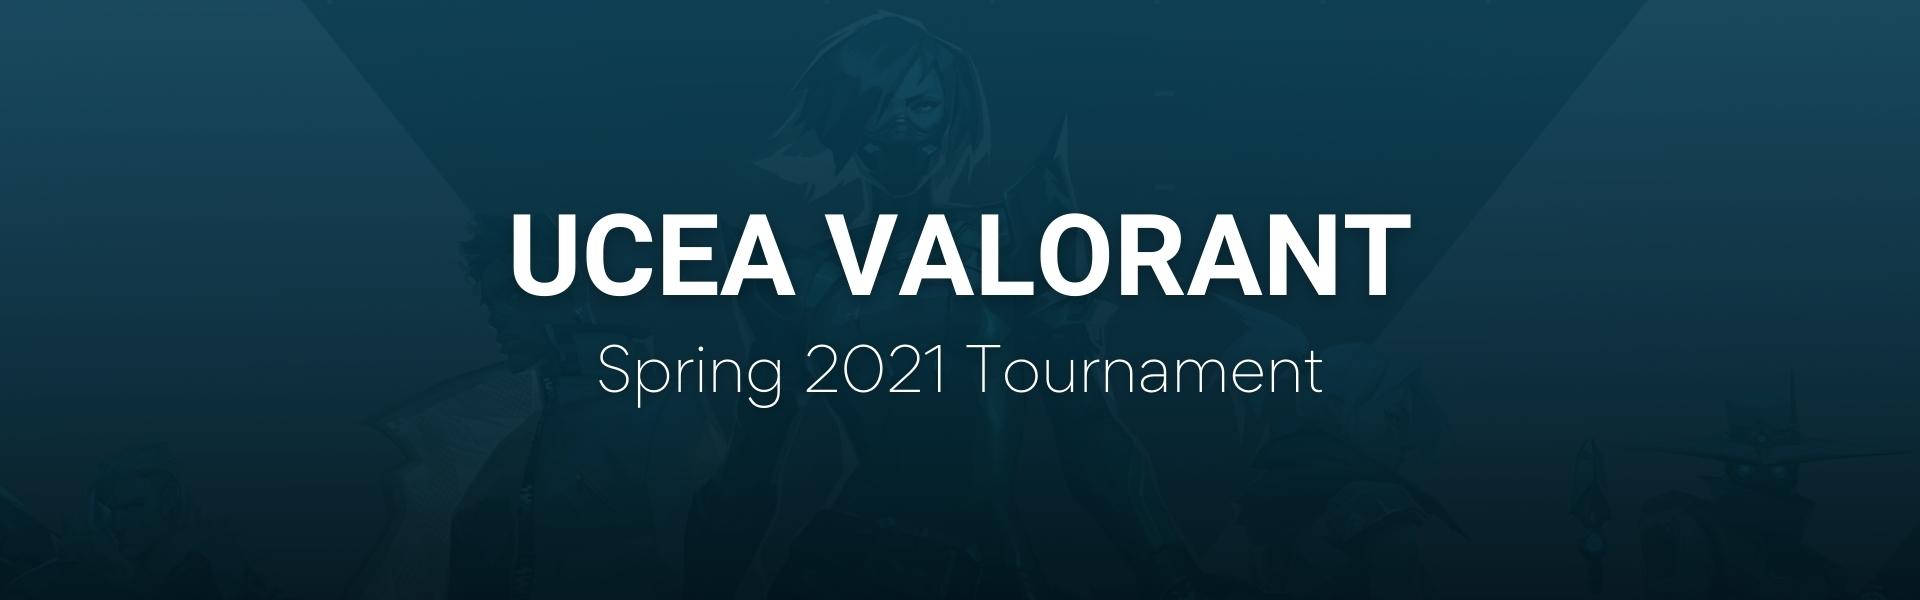 UCEA February Valorant